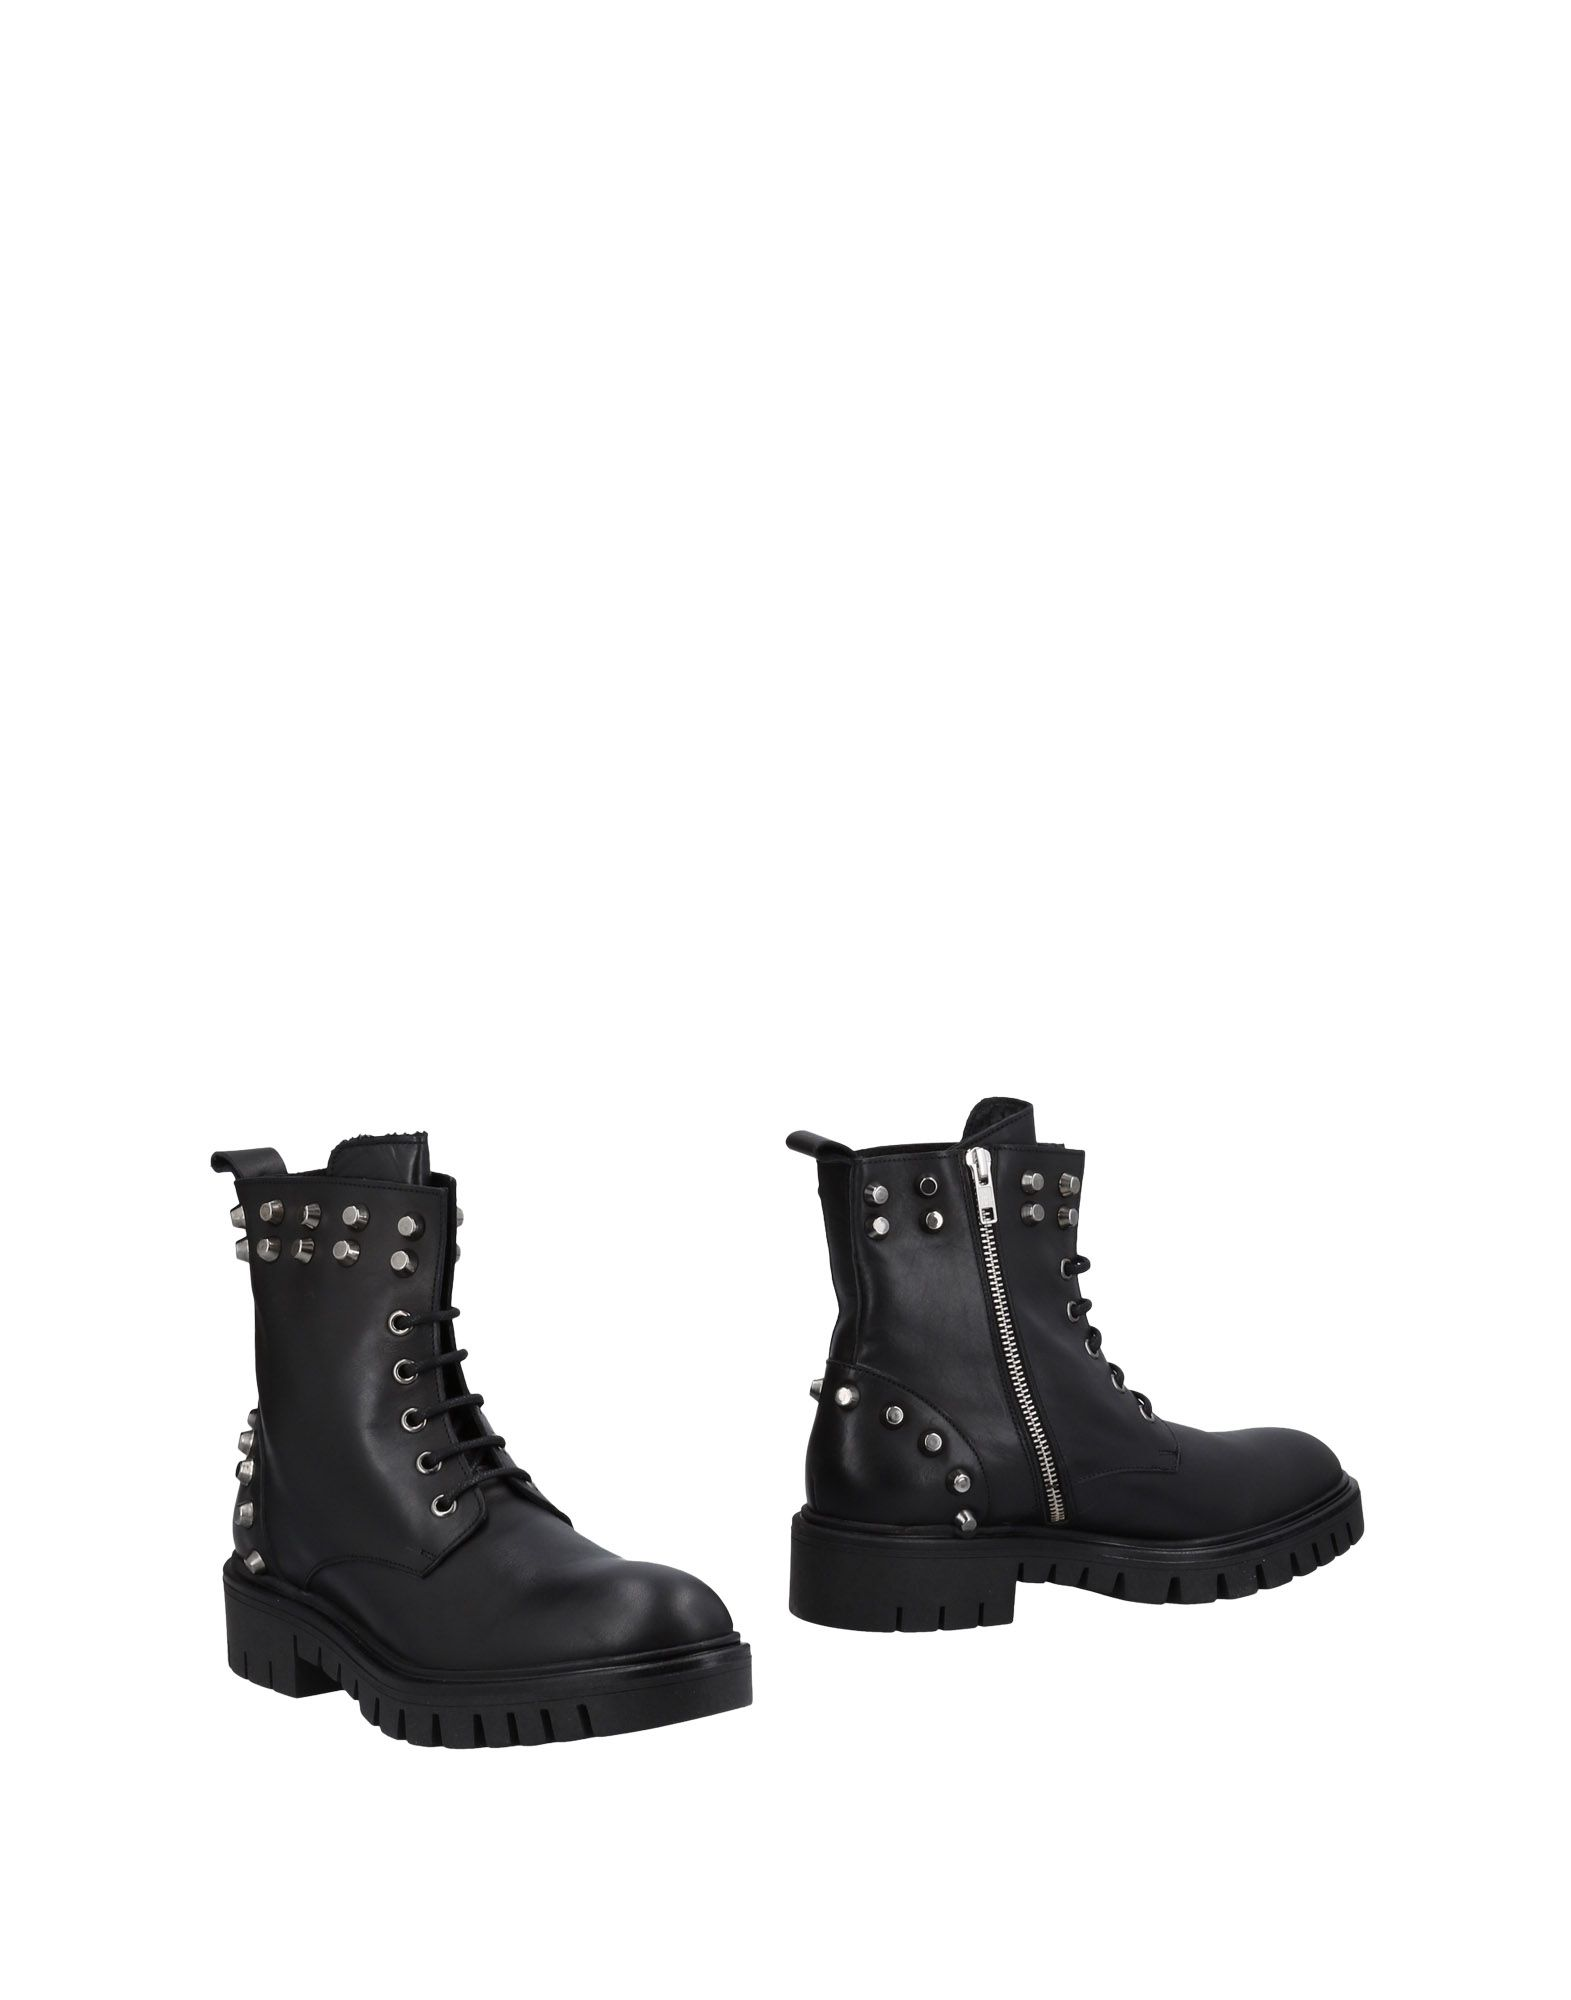 Loretta Pettinari Stiefelette Damen  11494086HHGut aussehende strapazierfähige Schuhe